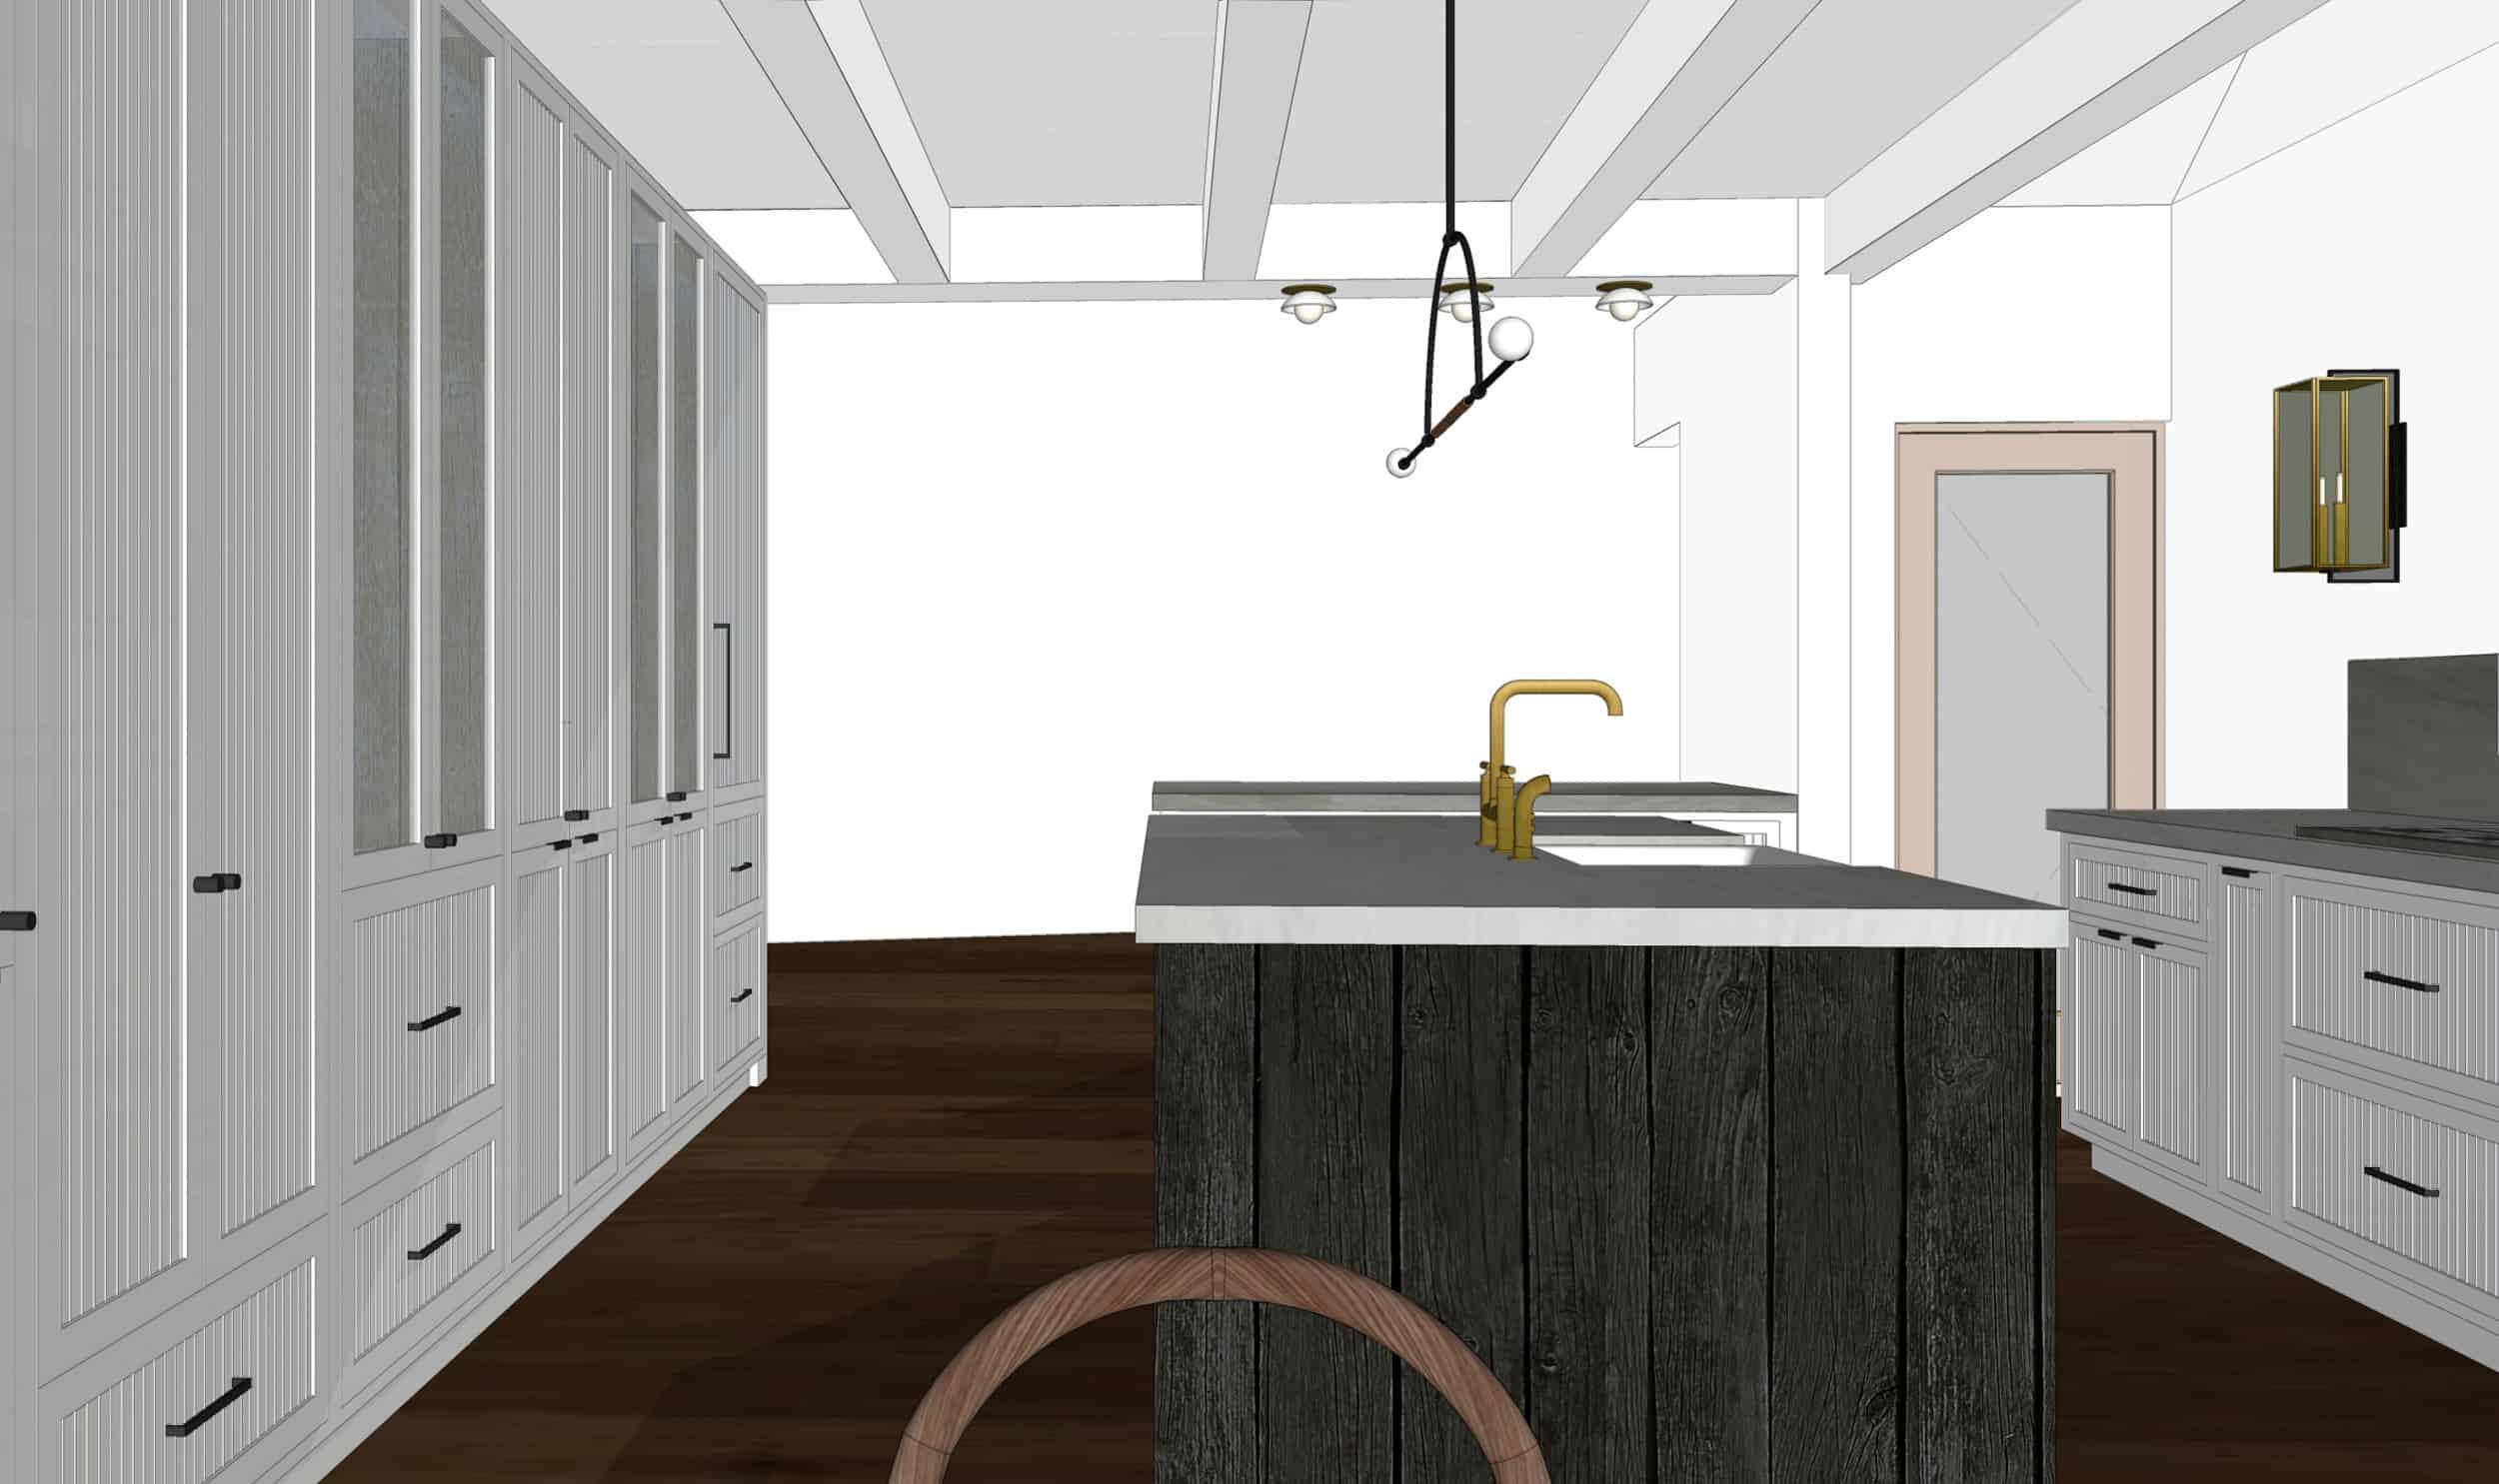 Emily Henderson Mountain Fixer Upper I Design You Decide Kitchen Render 06 Fnladj